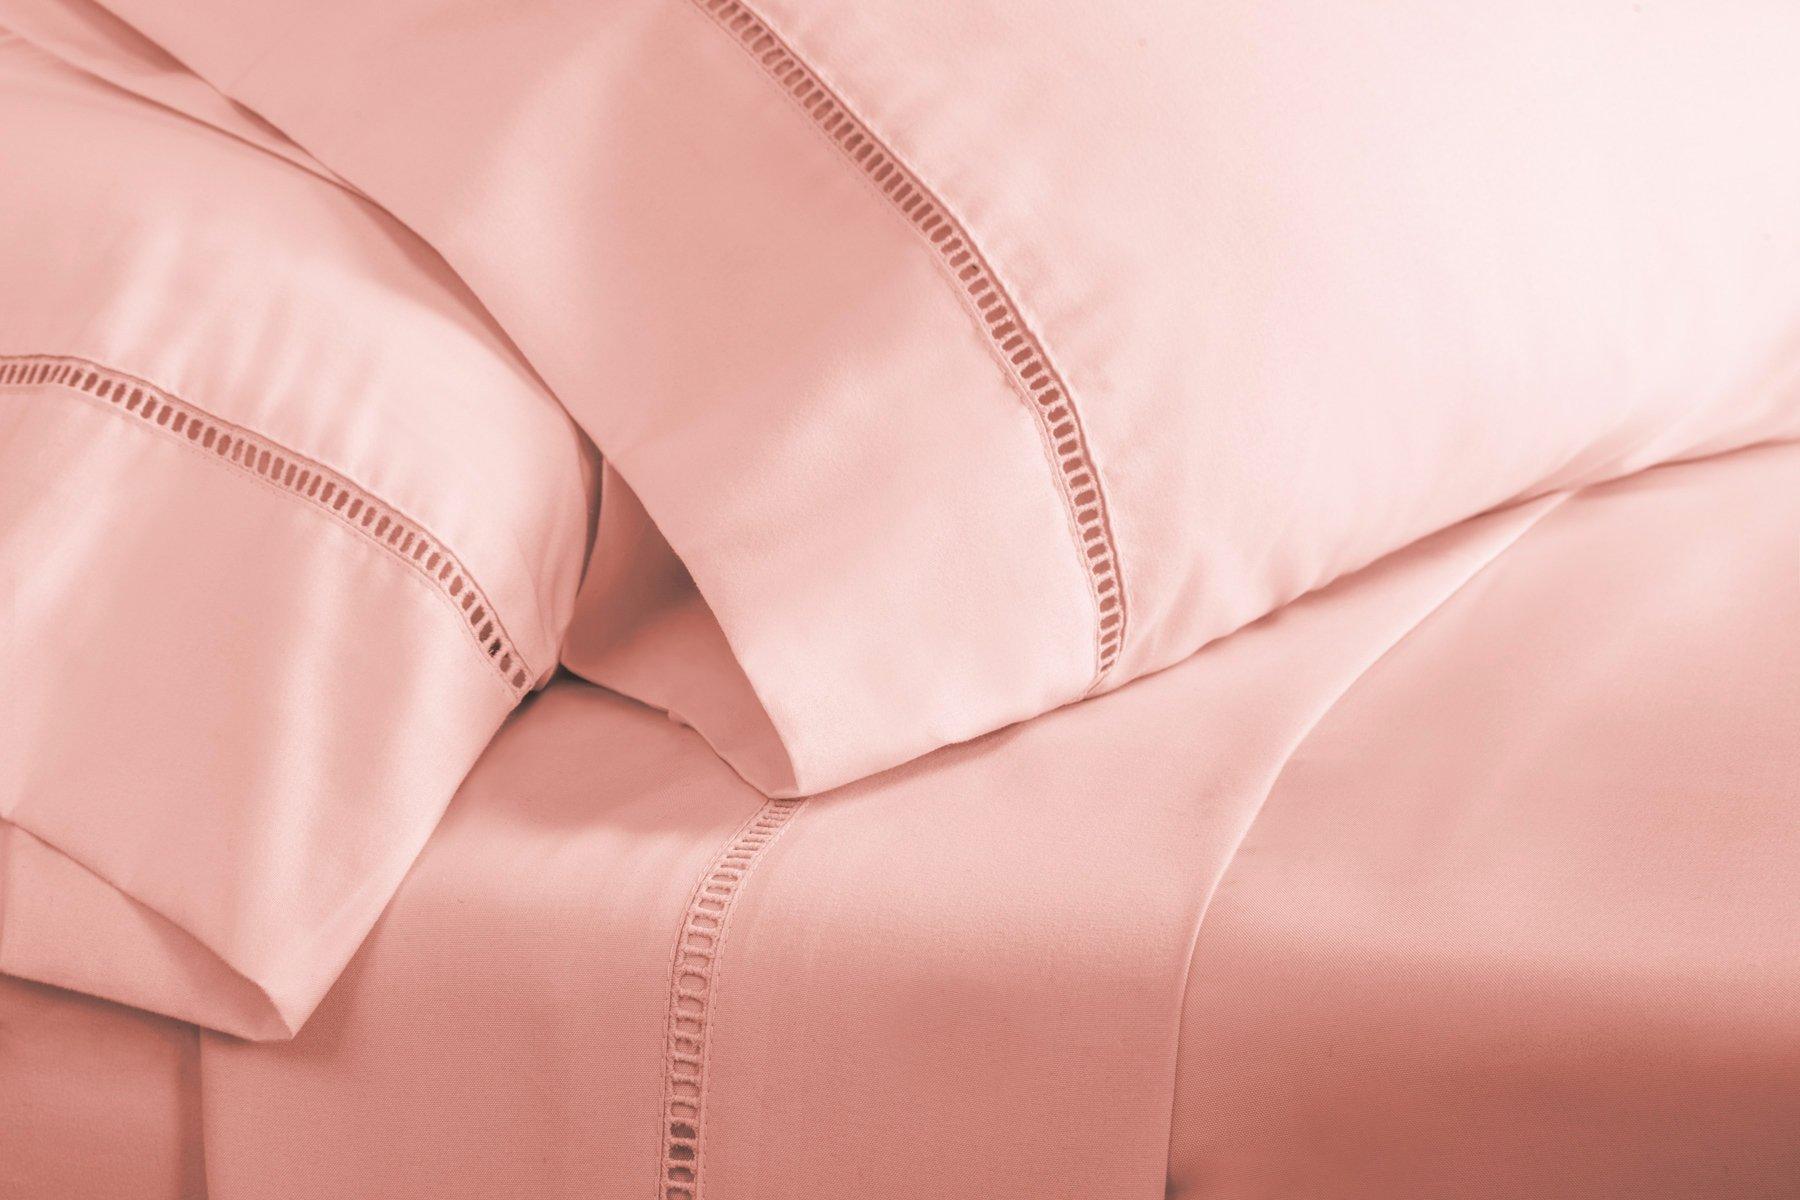 Grace Premium Microfiber Sheet Set - Super Soft, Deep Pocket, Embellished with Hypoallergenic, Wrinkle Resistant and Fade Resistant Brushed Microfiber – 4 Piece Set (Full, Pink) by ViscoSoft (Image #5)